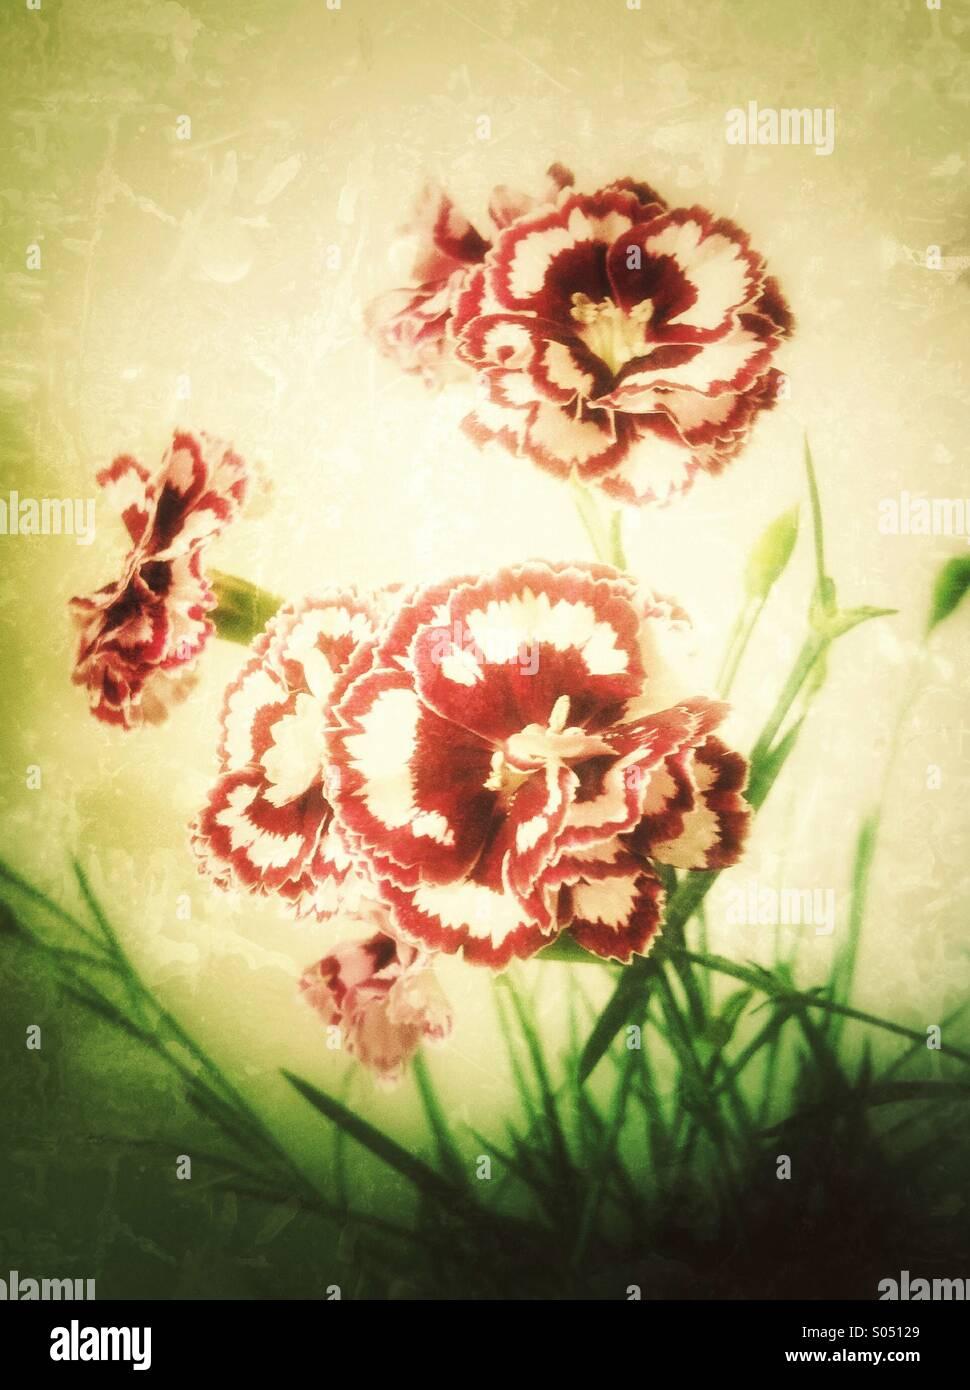 Rojo blanco dianthus flores Imagen De Stock